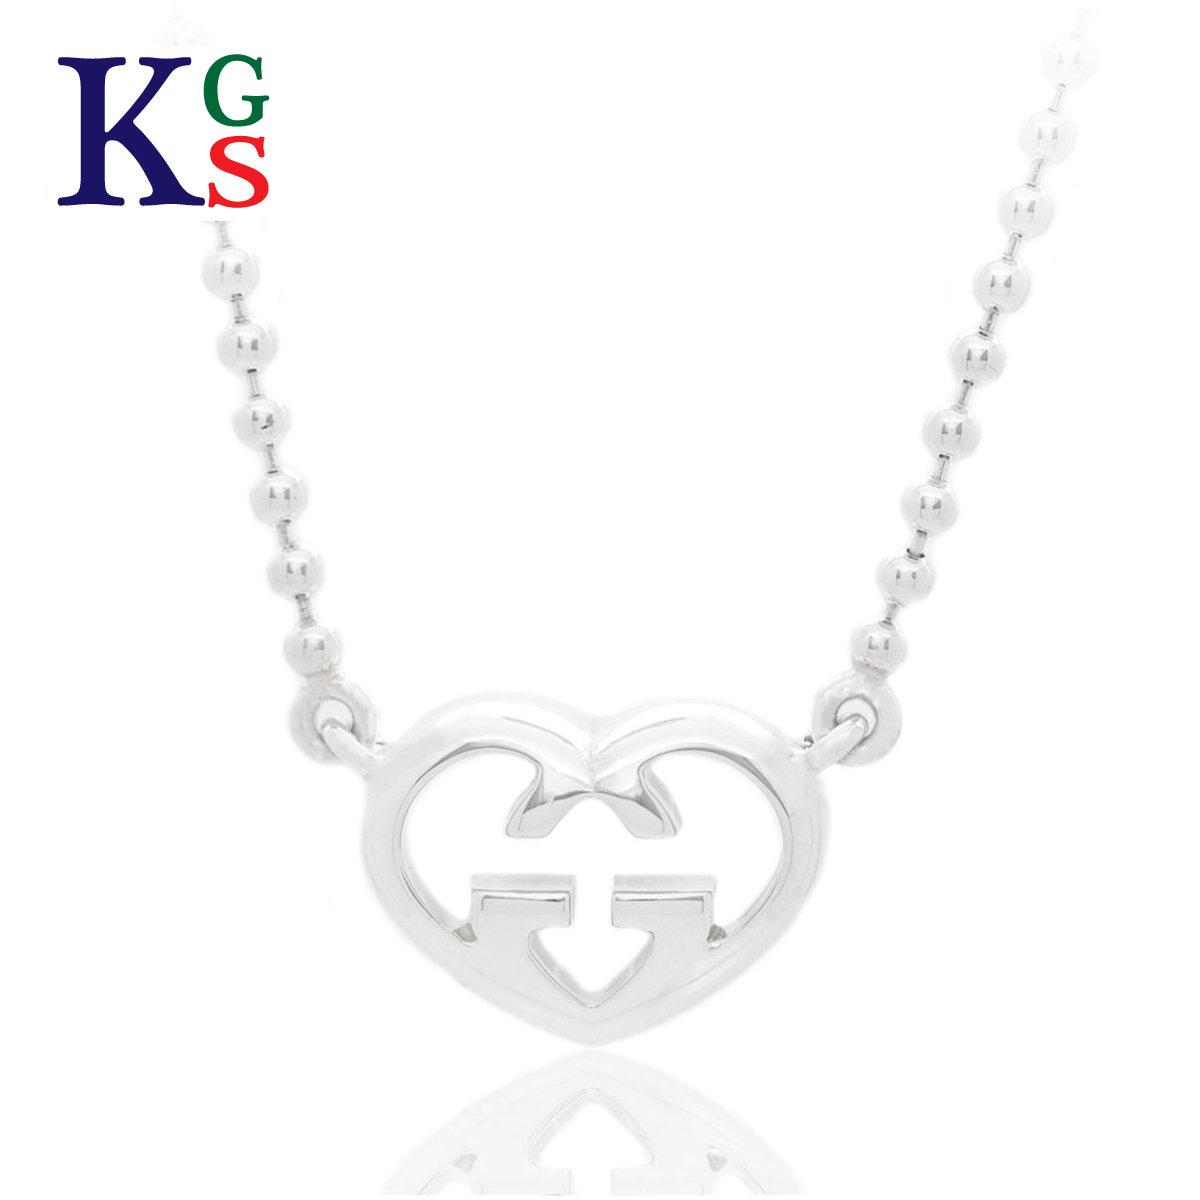 7d2dc34e8 karyon: Gucci /GUCCI / interlocking grip G heart motif necklace &  pierced earrings / Lady's accessories / sterling silver / 40cm / 246573  J8400 8106 ...